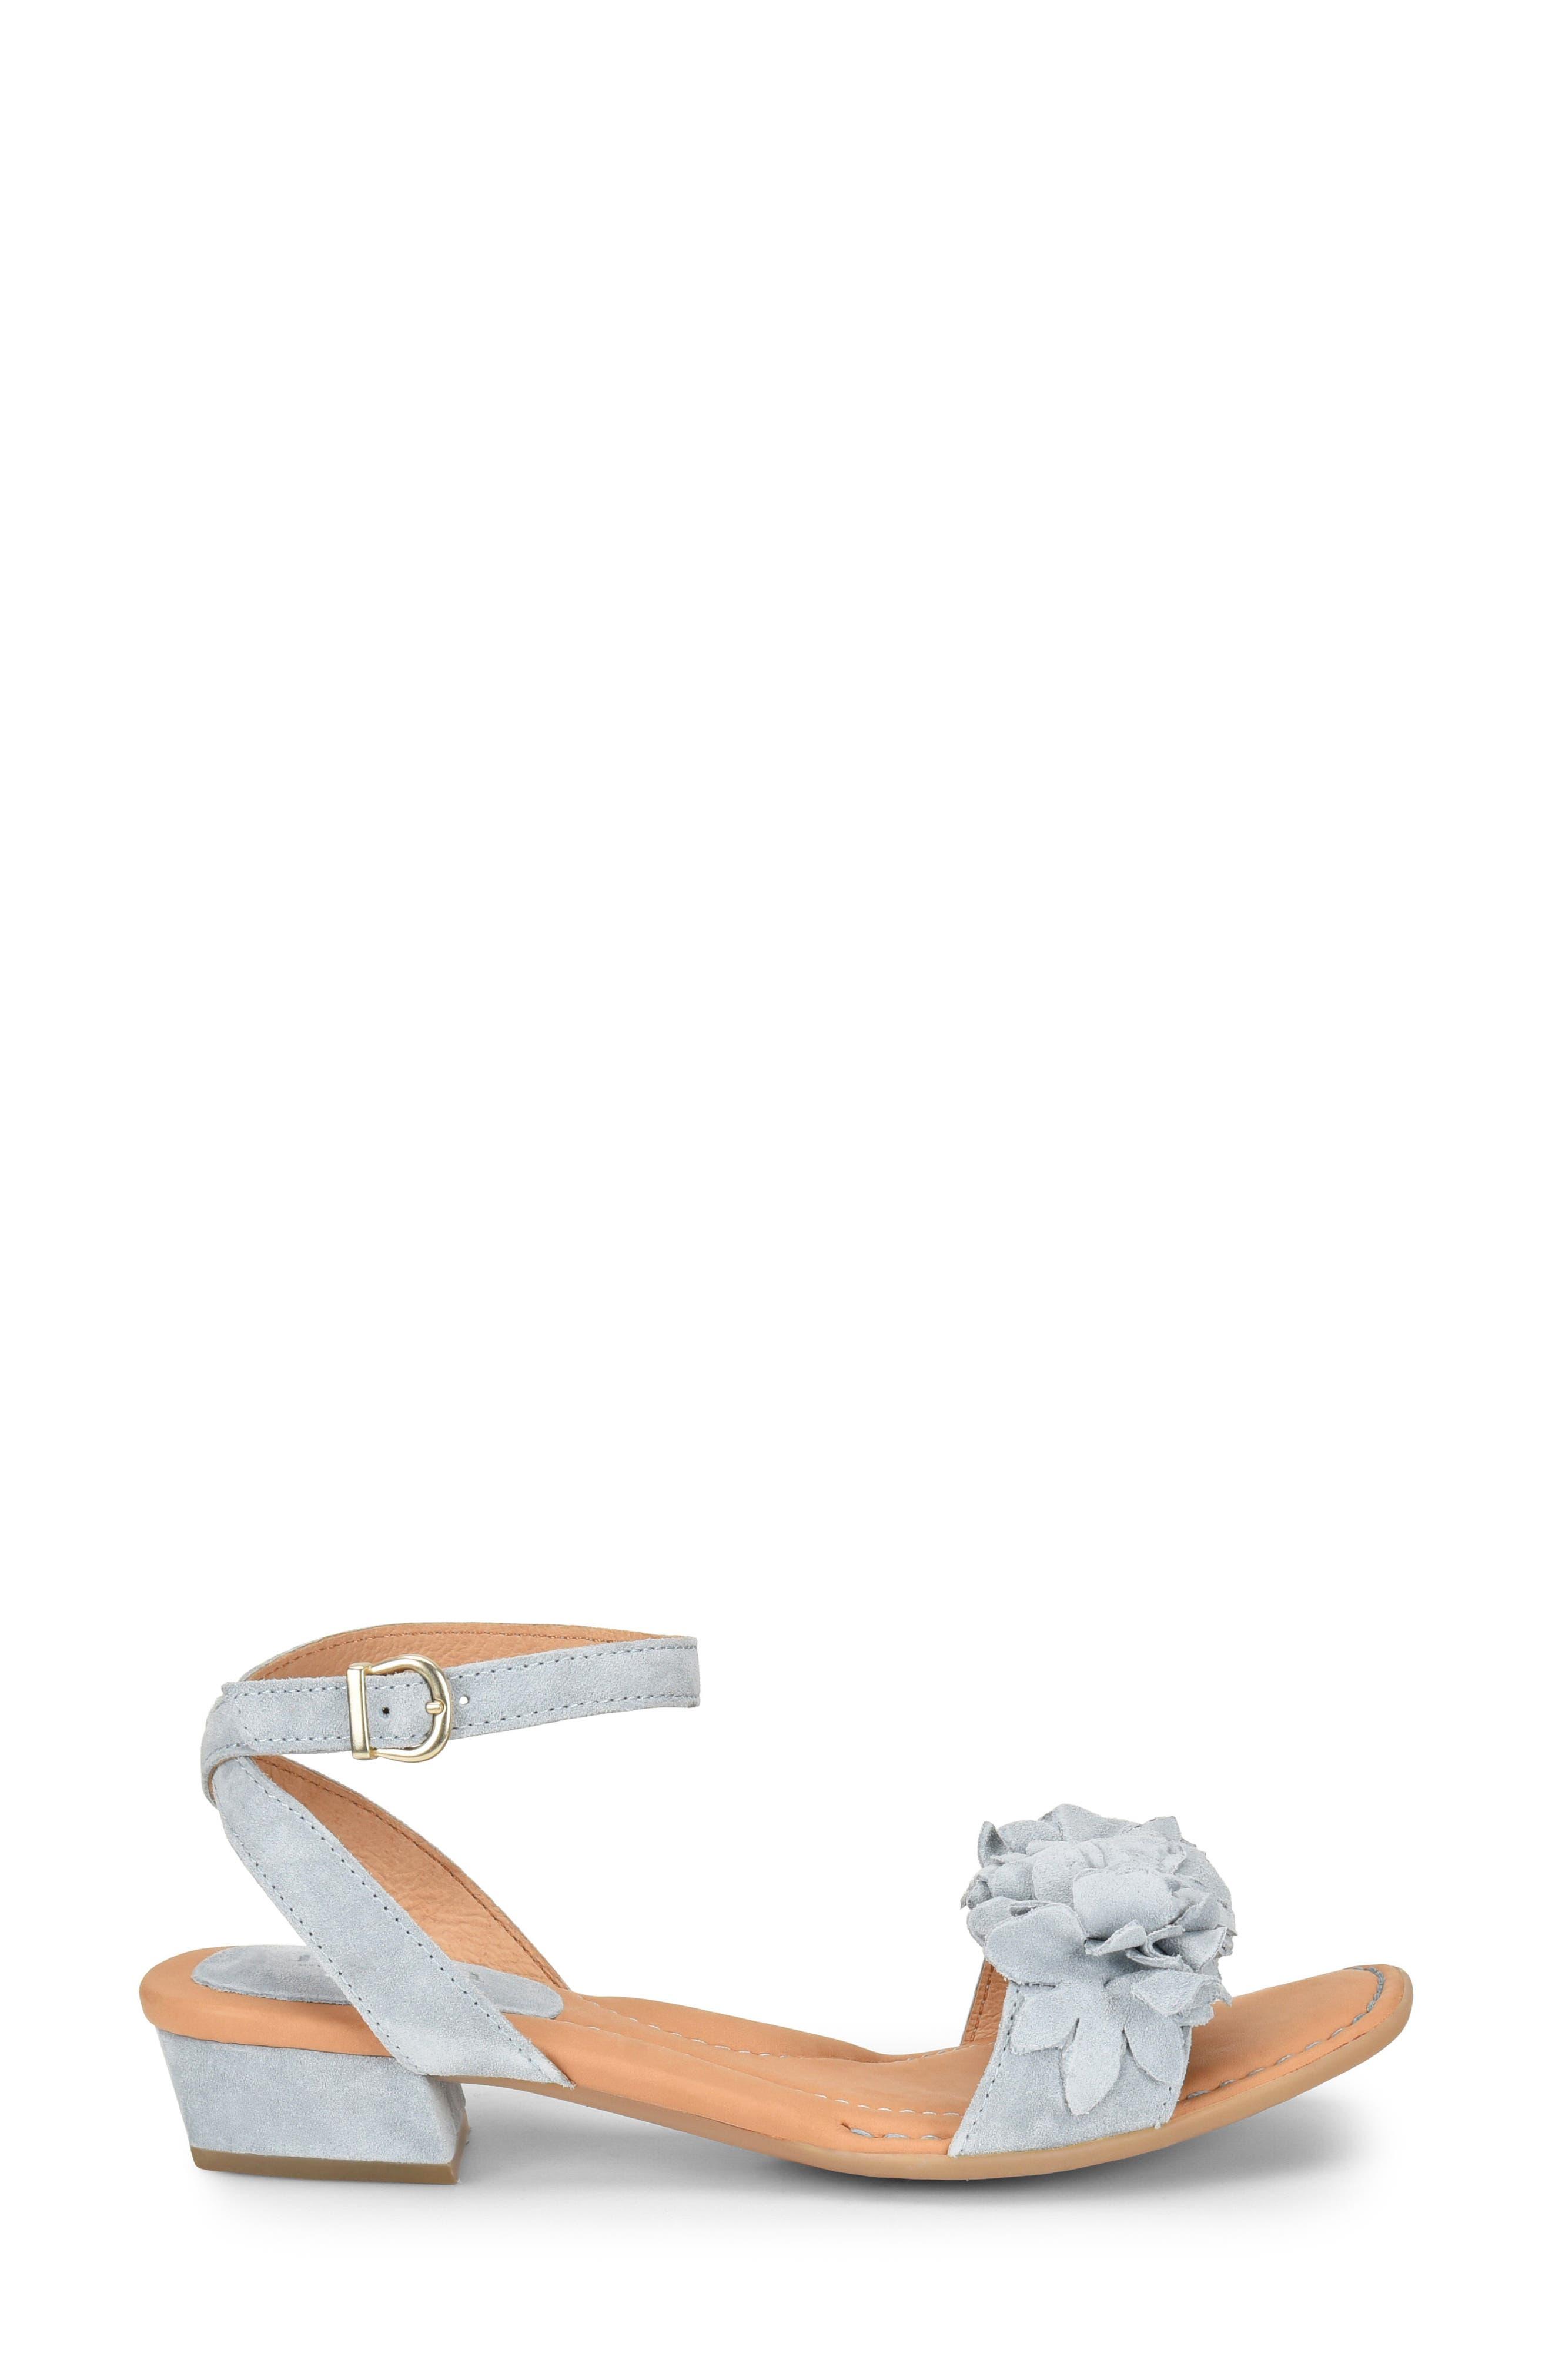 Bouvet Sandal,                             Alternate thumbnail 10, color,